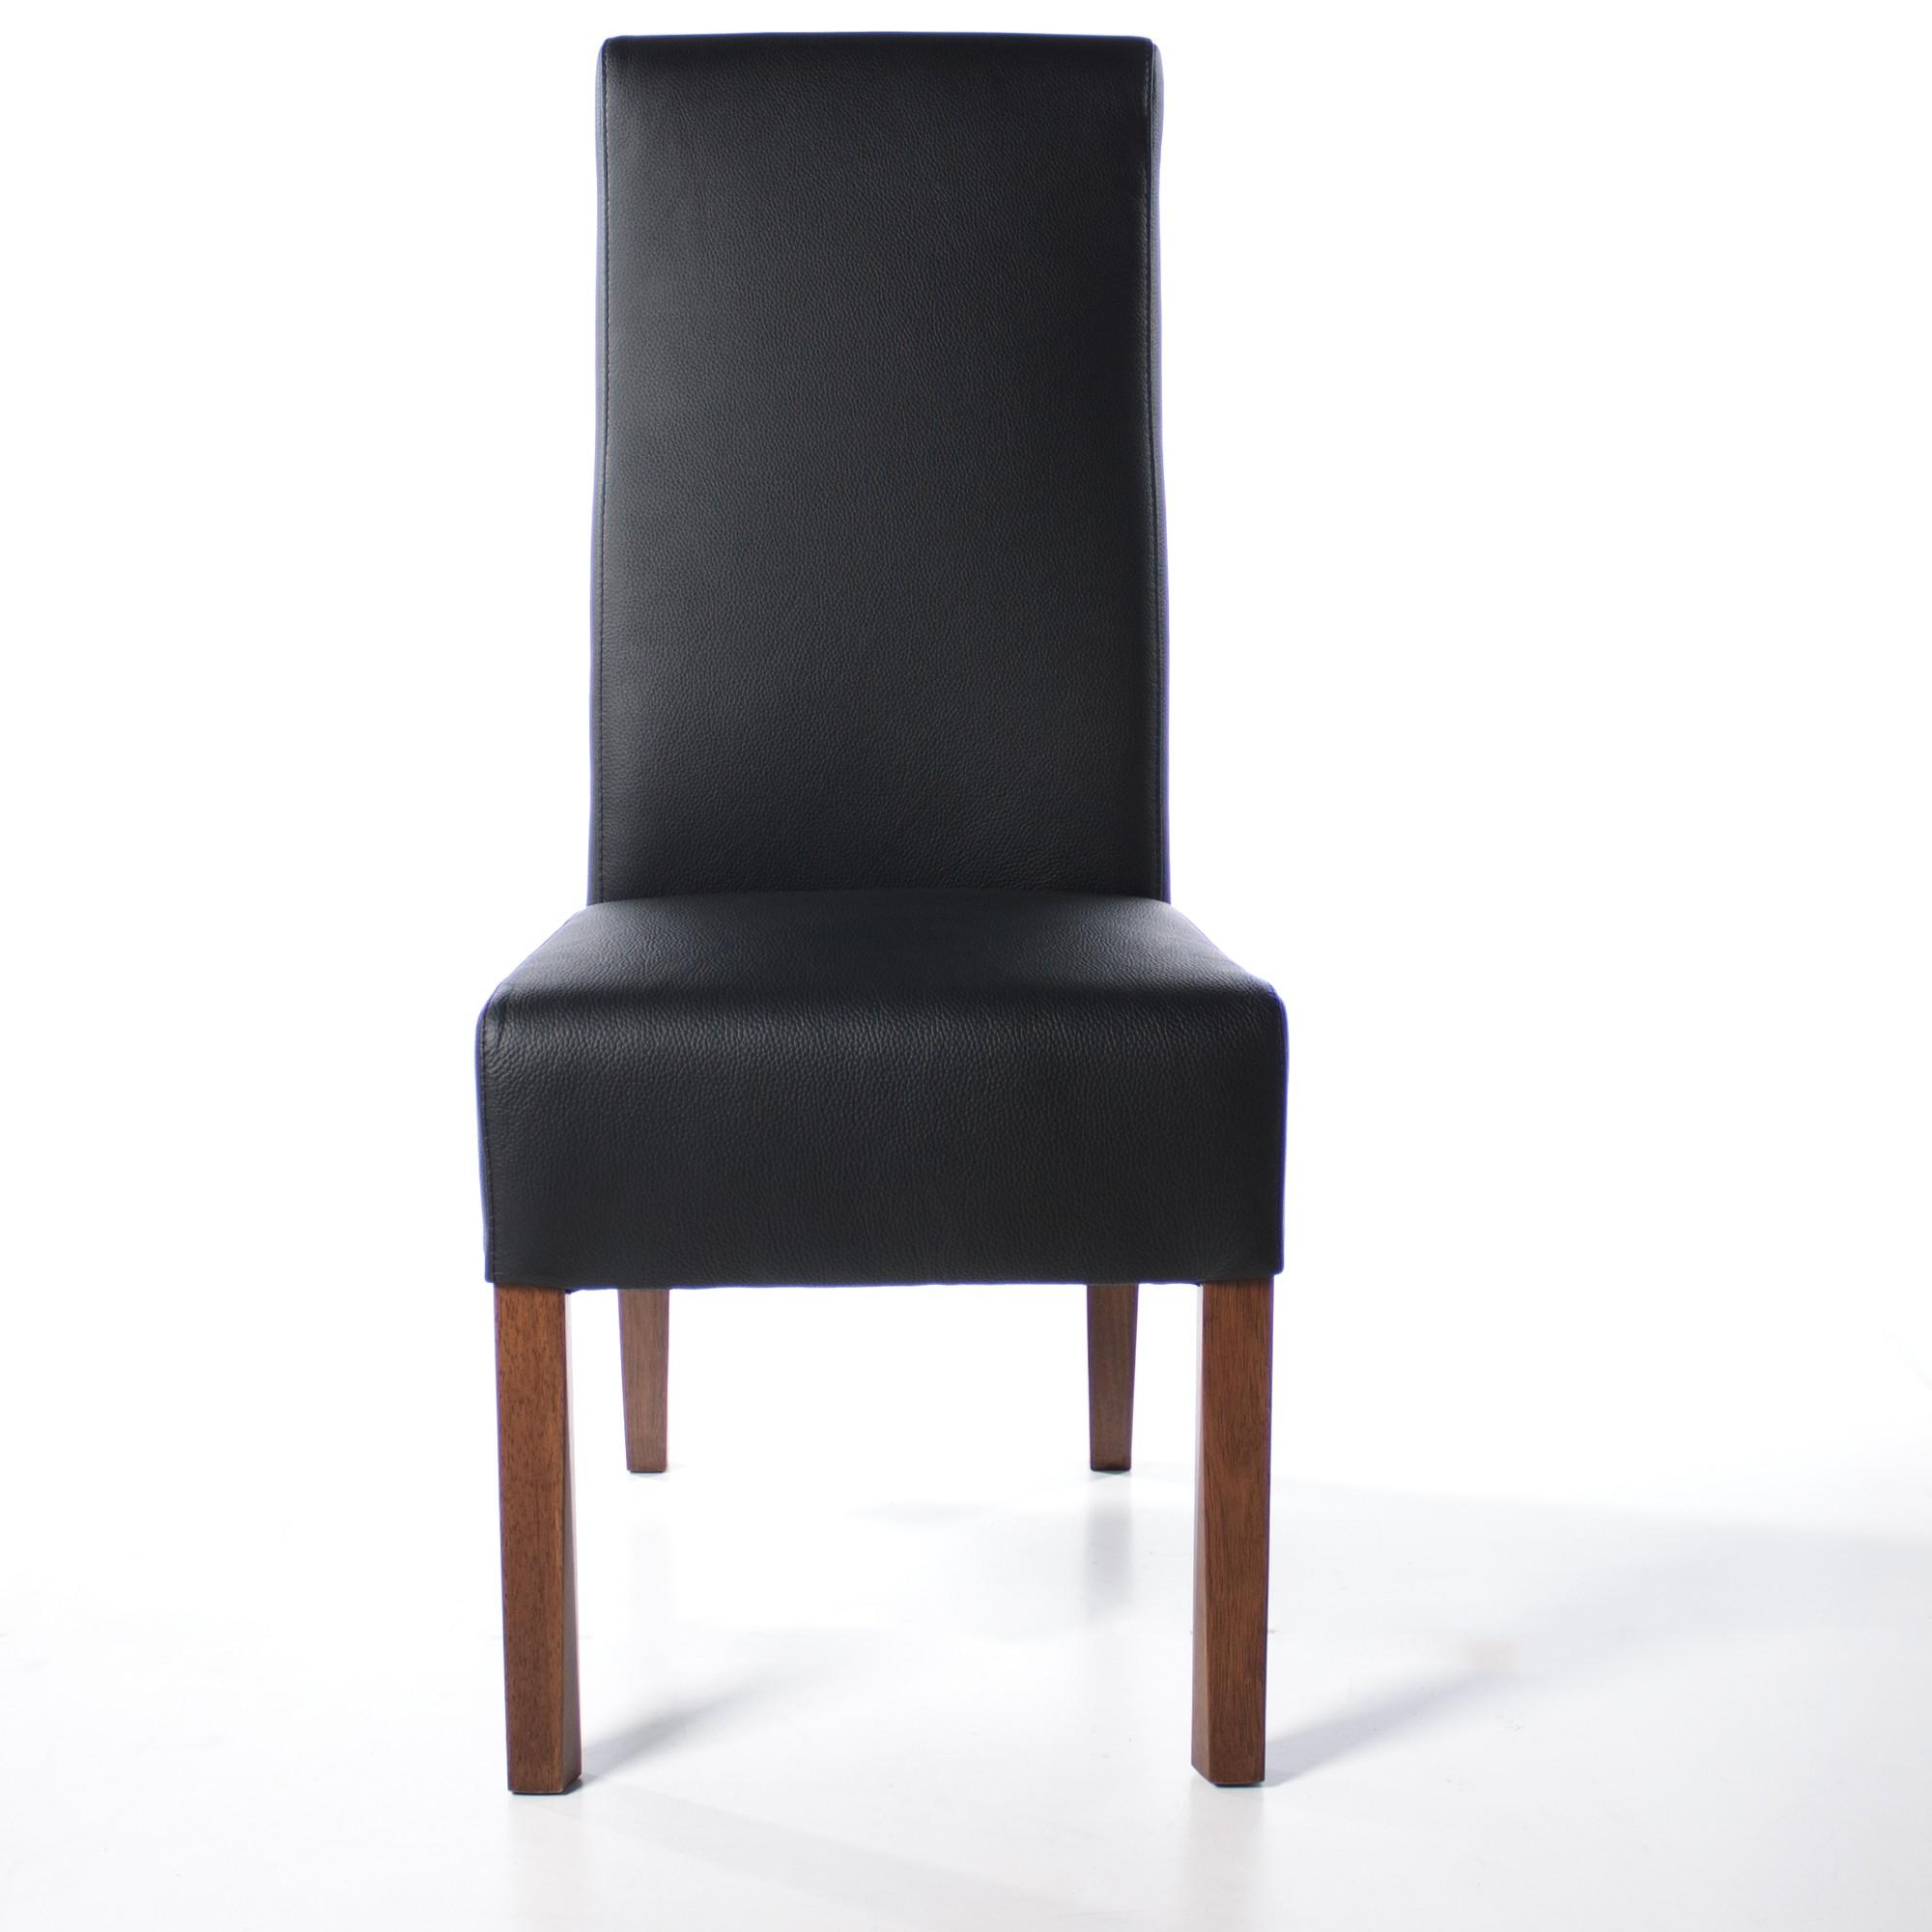 lederstuhl regina federkern schwarz nussbaum. Black Bedroom Furniture Sets. Home Design Ideas